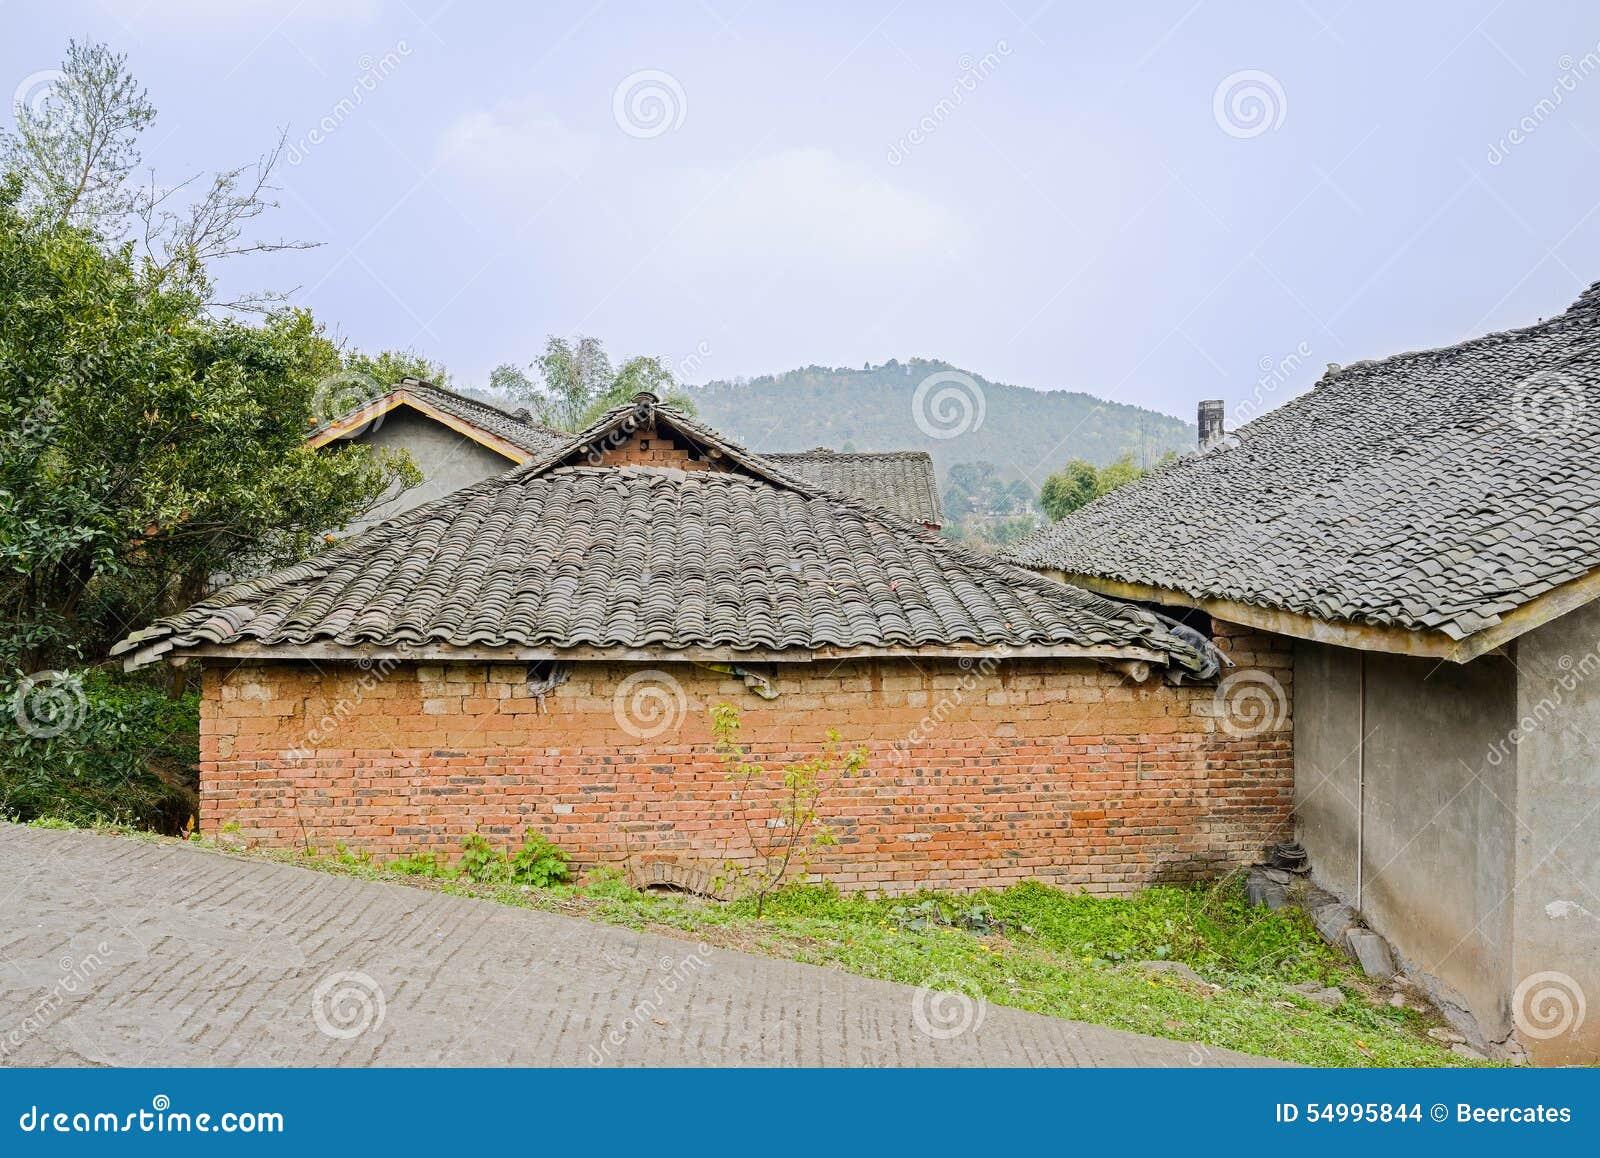 Oude Chinese boerderijen door slopy countryroad in de zonnige lente